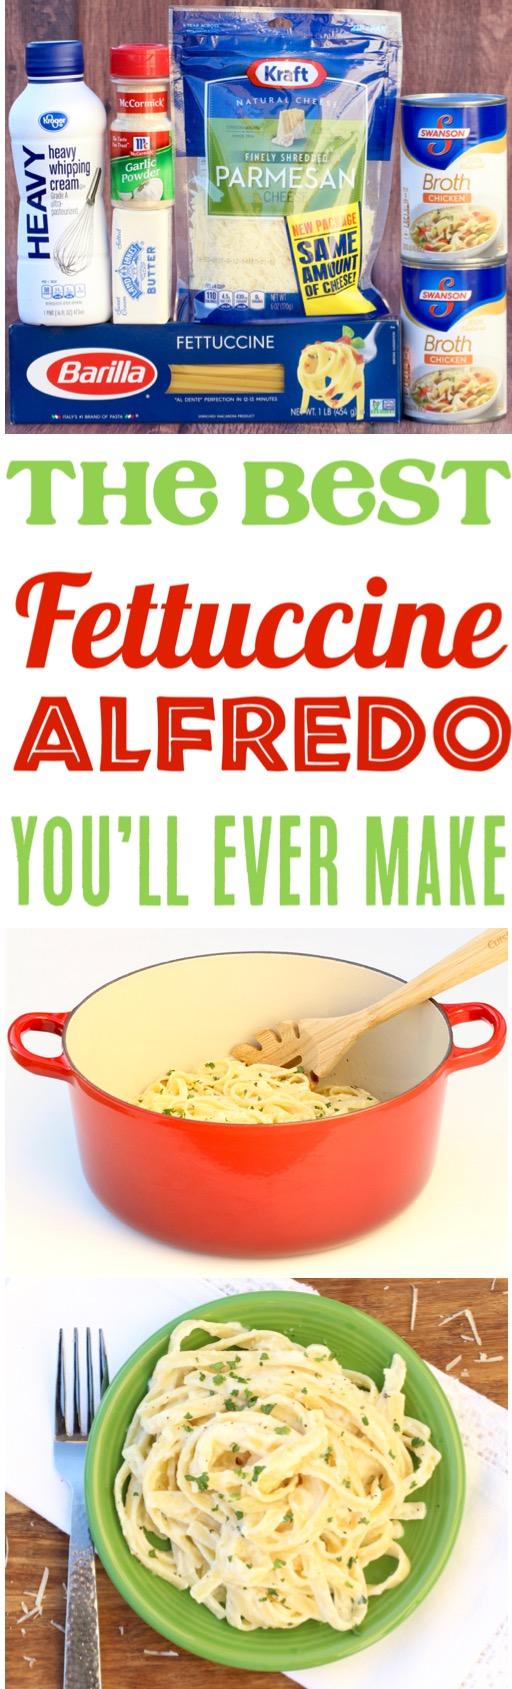 Fettucini Alfredo Recipe Easy Olive Garden Copycat One Pot Dinner Recipe